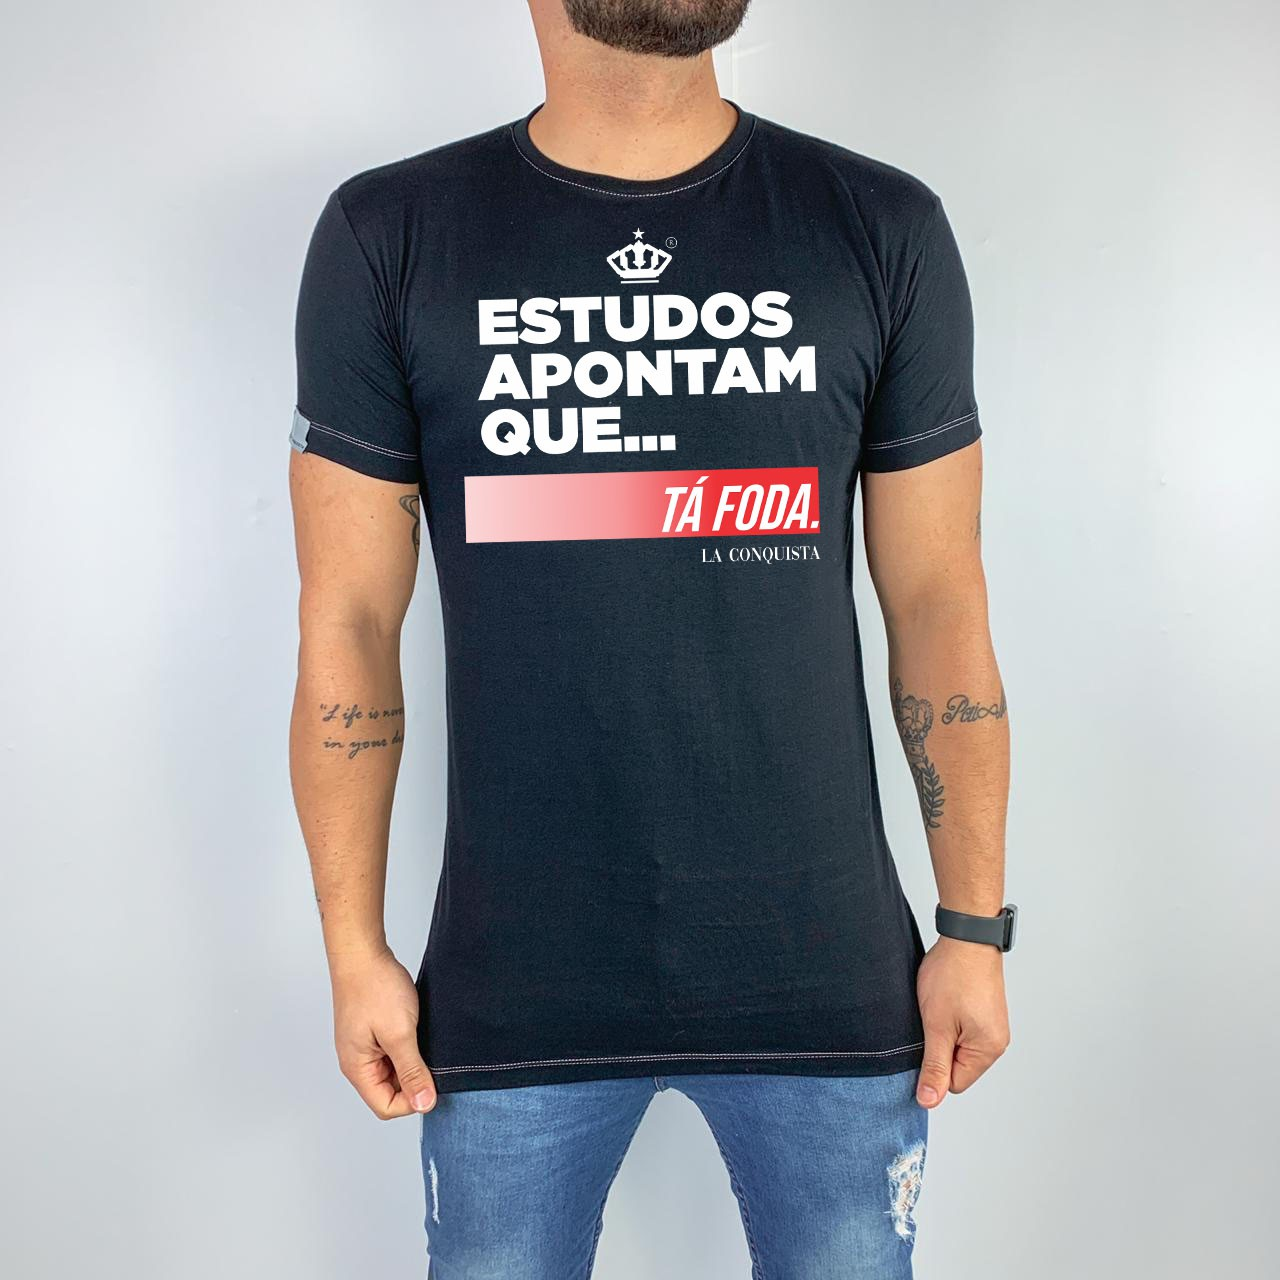 Camiseta Estudos apontam...